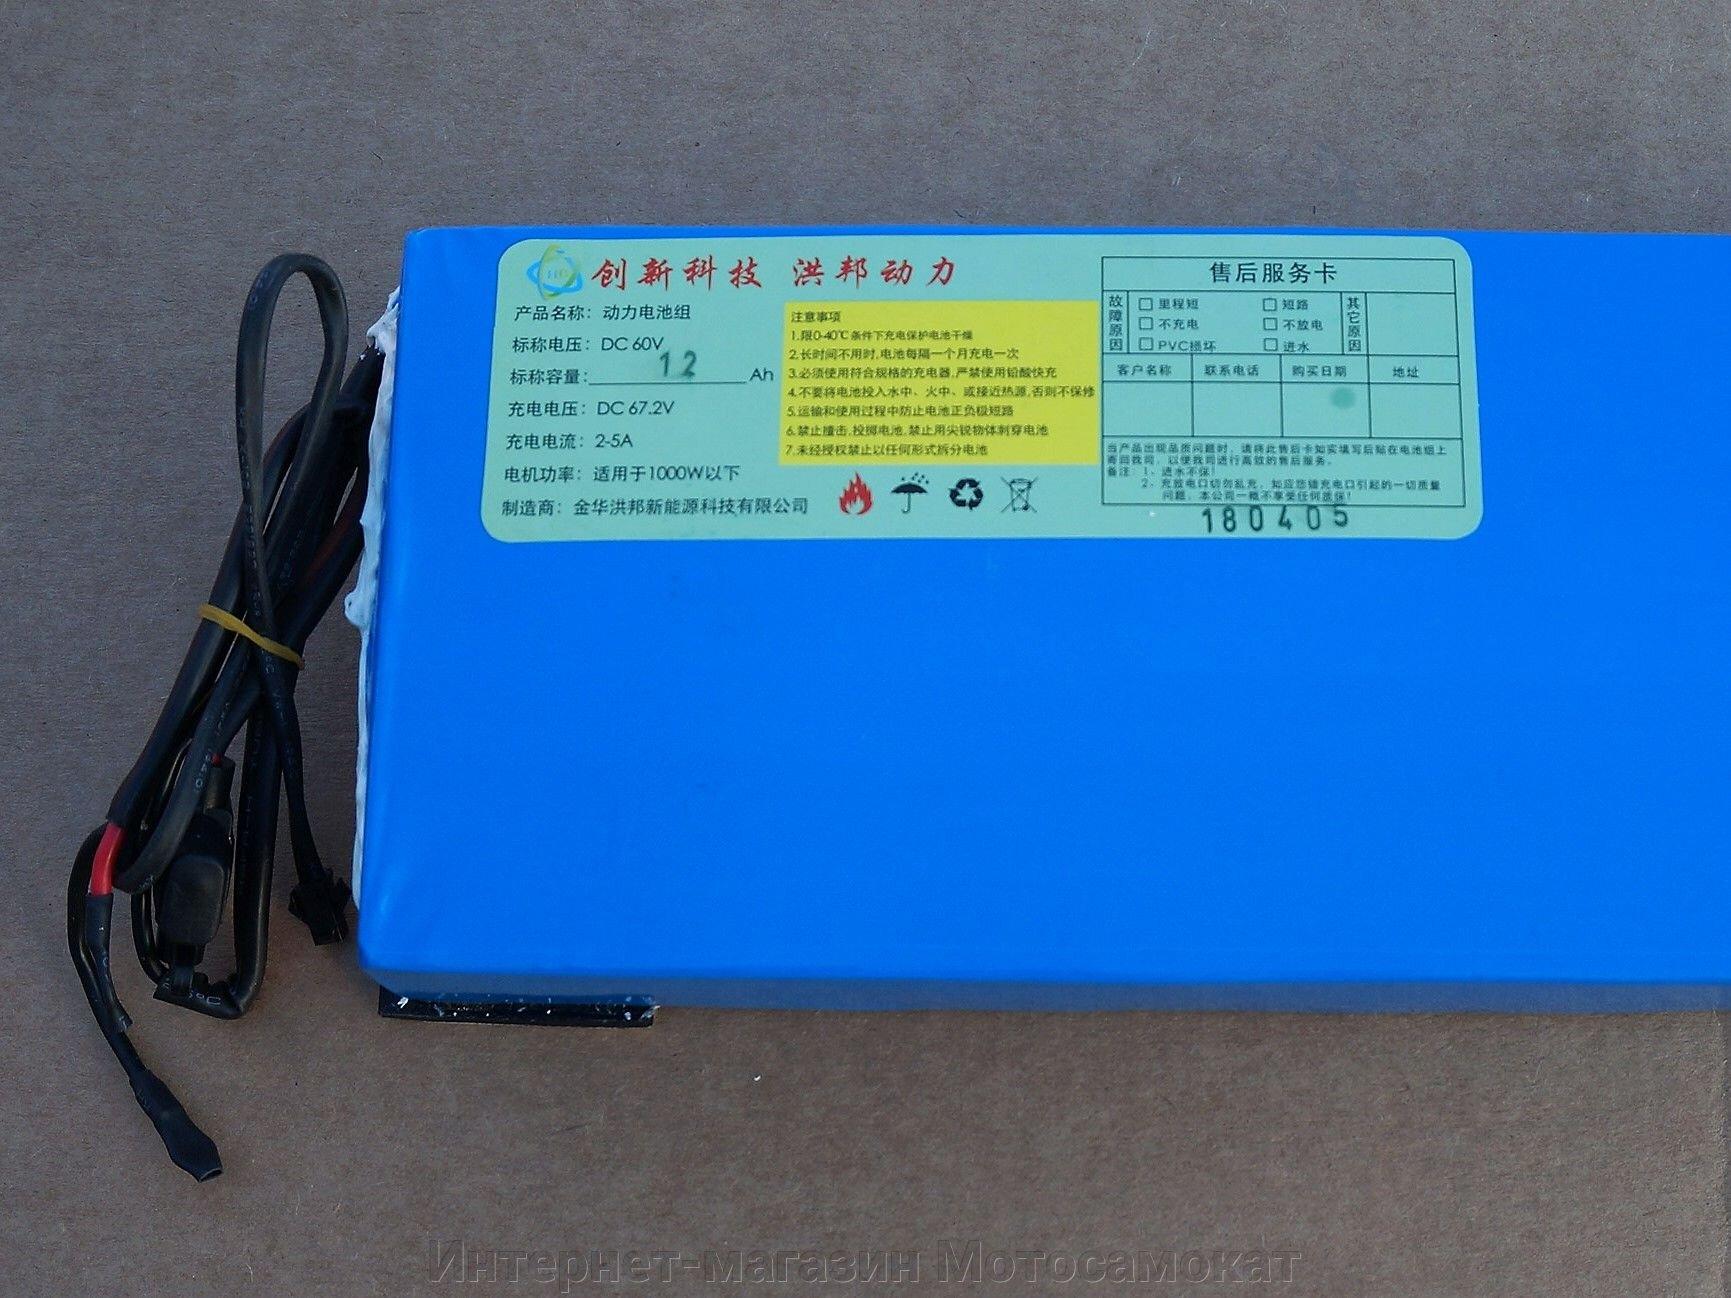 Аккумулятор Li-ion 60v 12Ah для электросамоката Citycoco, seev, woqu, scrooser